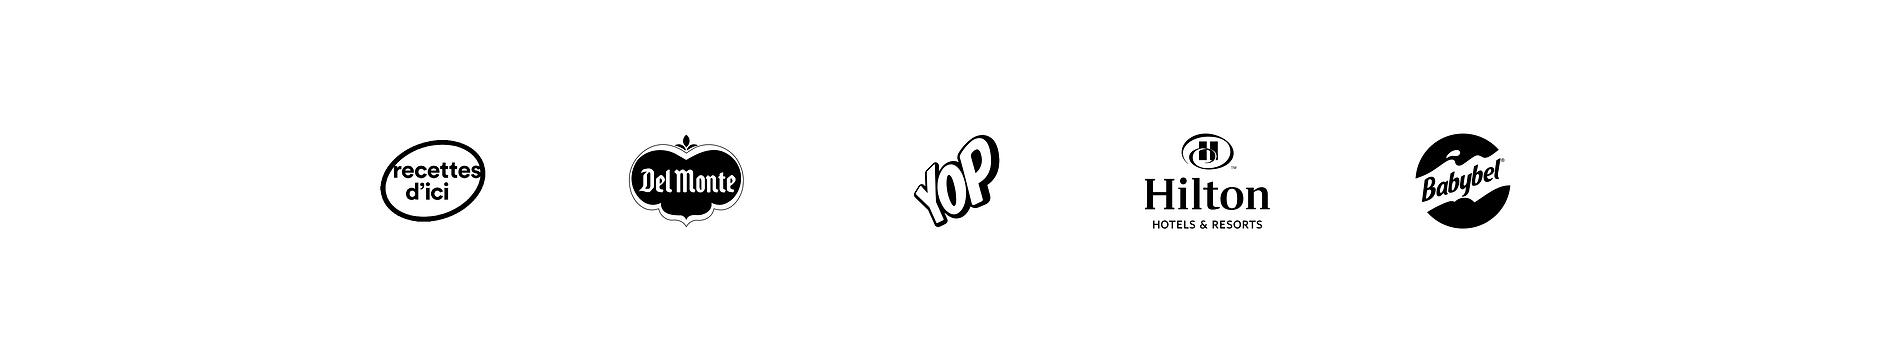 LOGOS_TIKTOK – 2.png